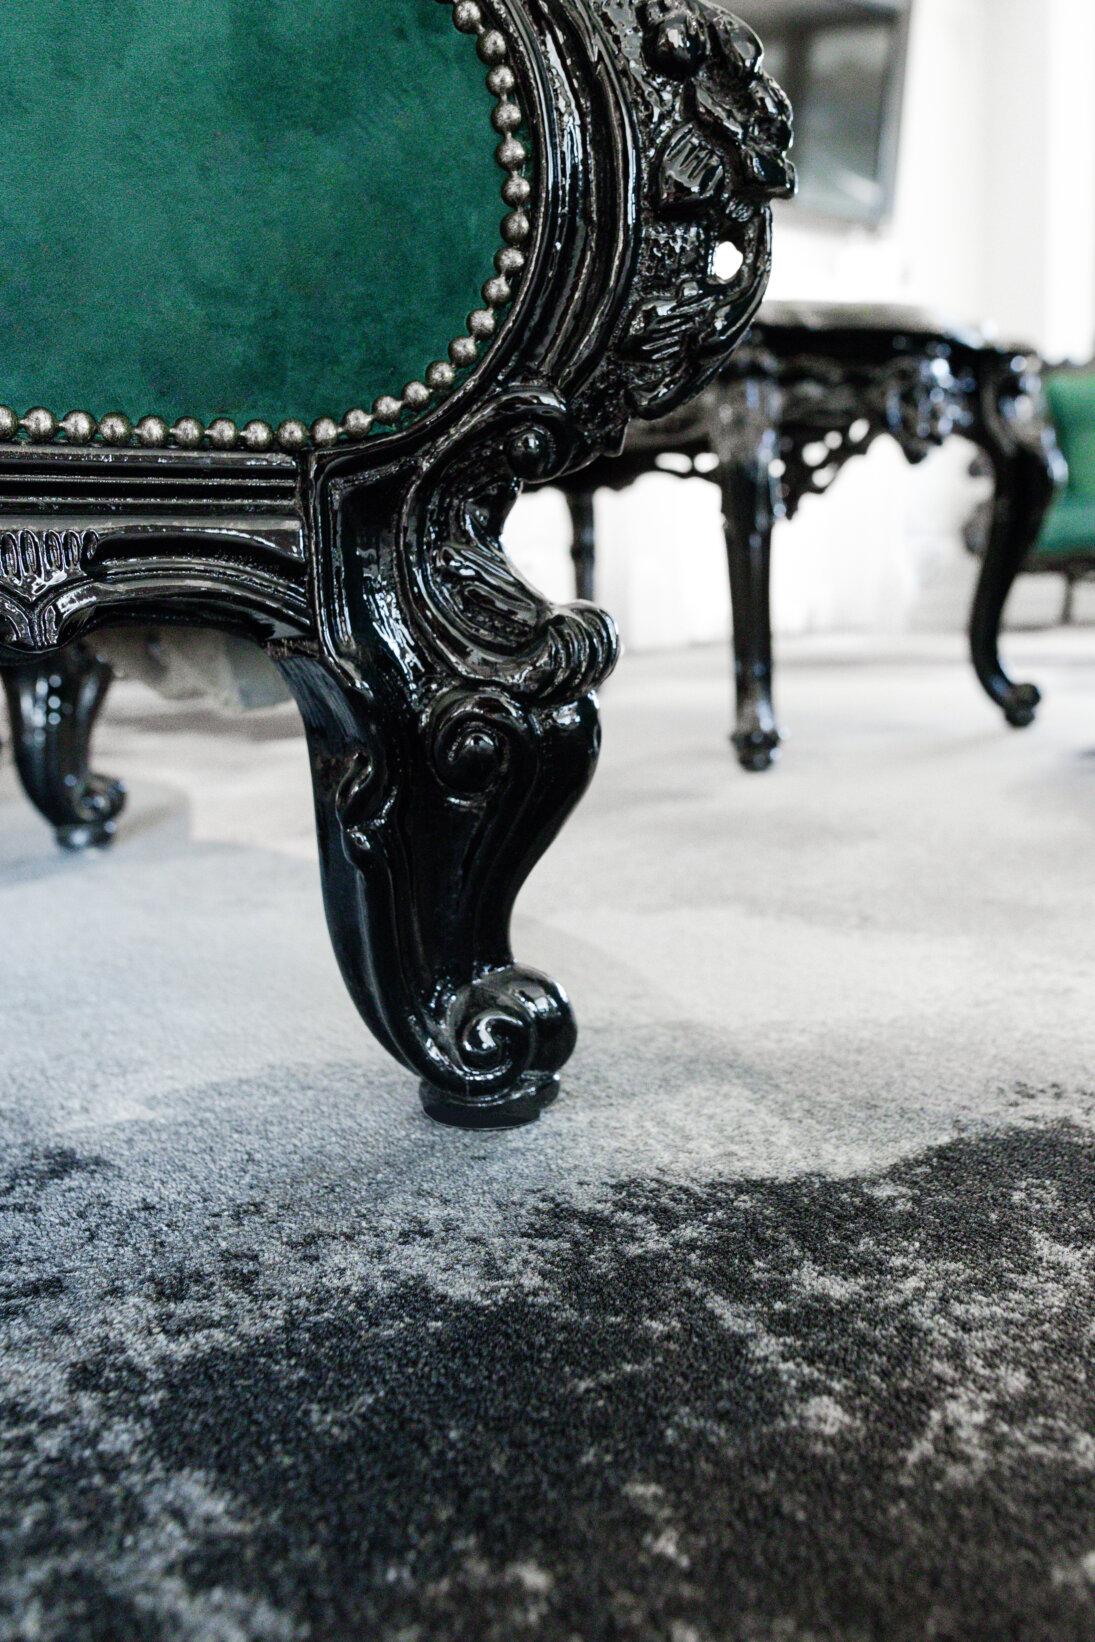 20210303-carpet&more-hotel-rocca-craiovaby-hugmedia-07